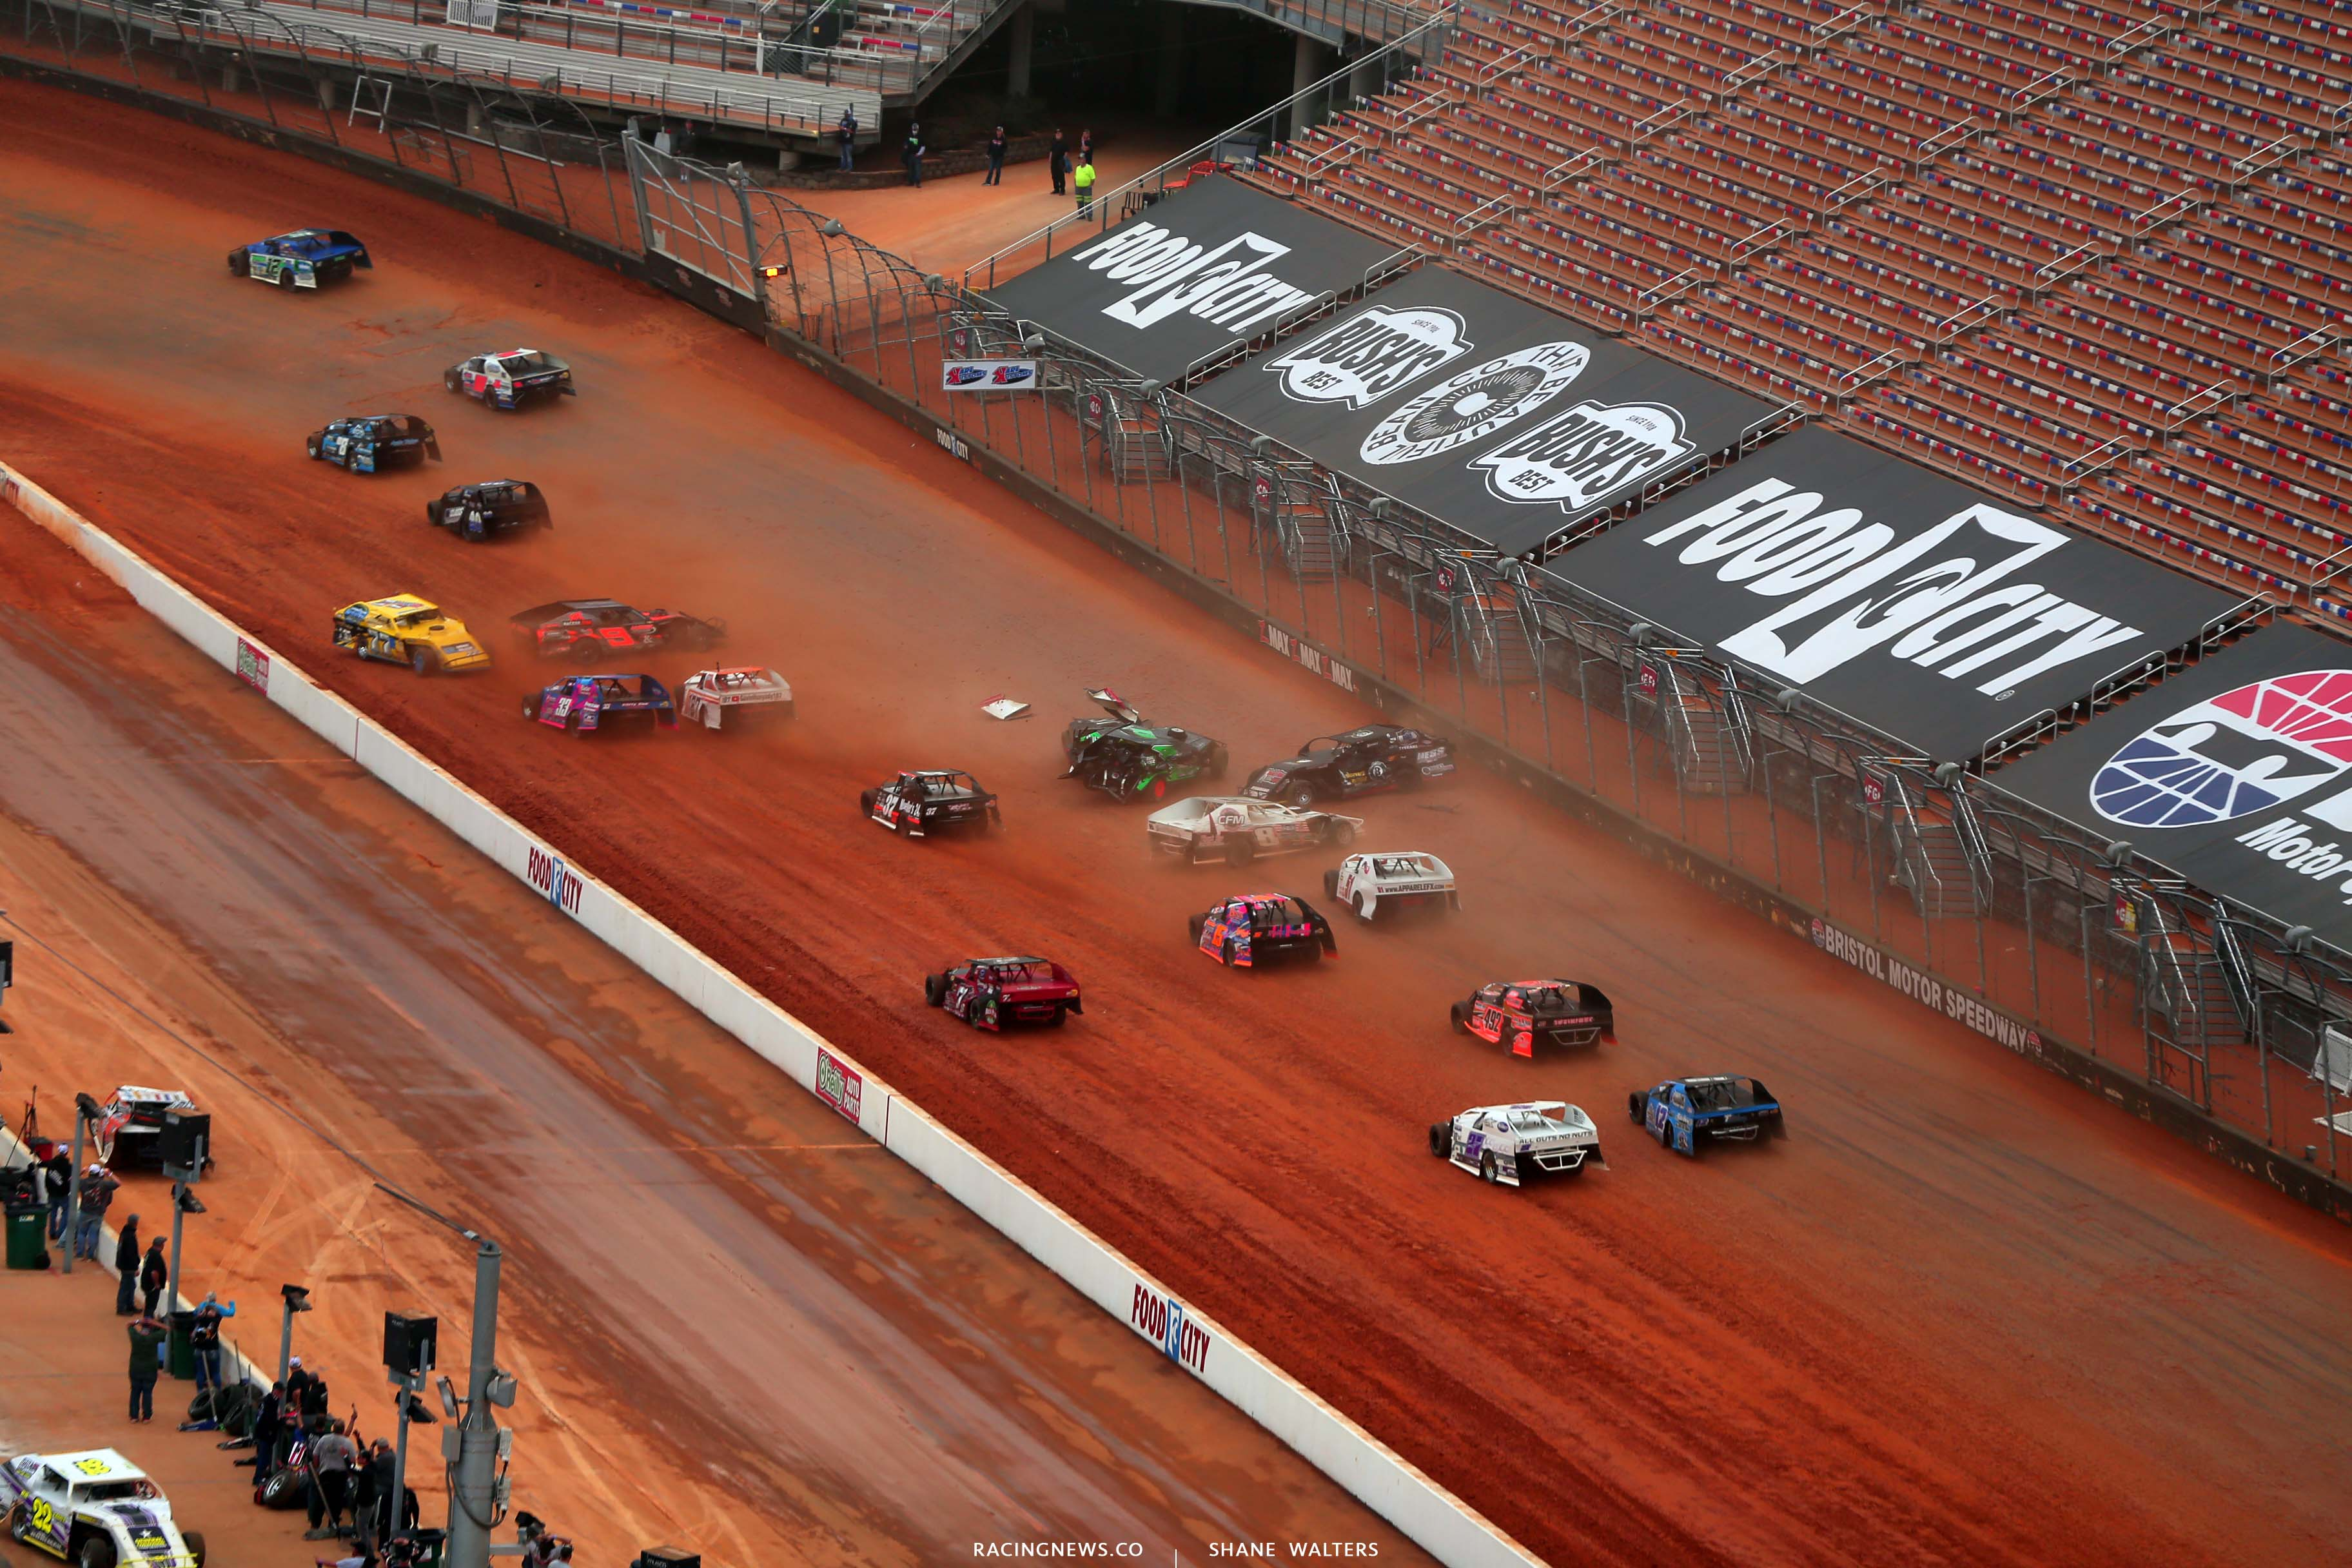 P - Dirt modified crash at Bristol Motor Speedway dirt track